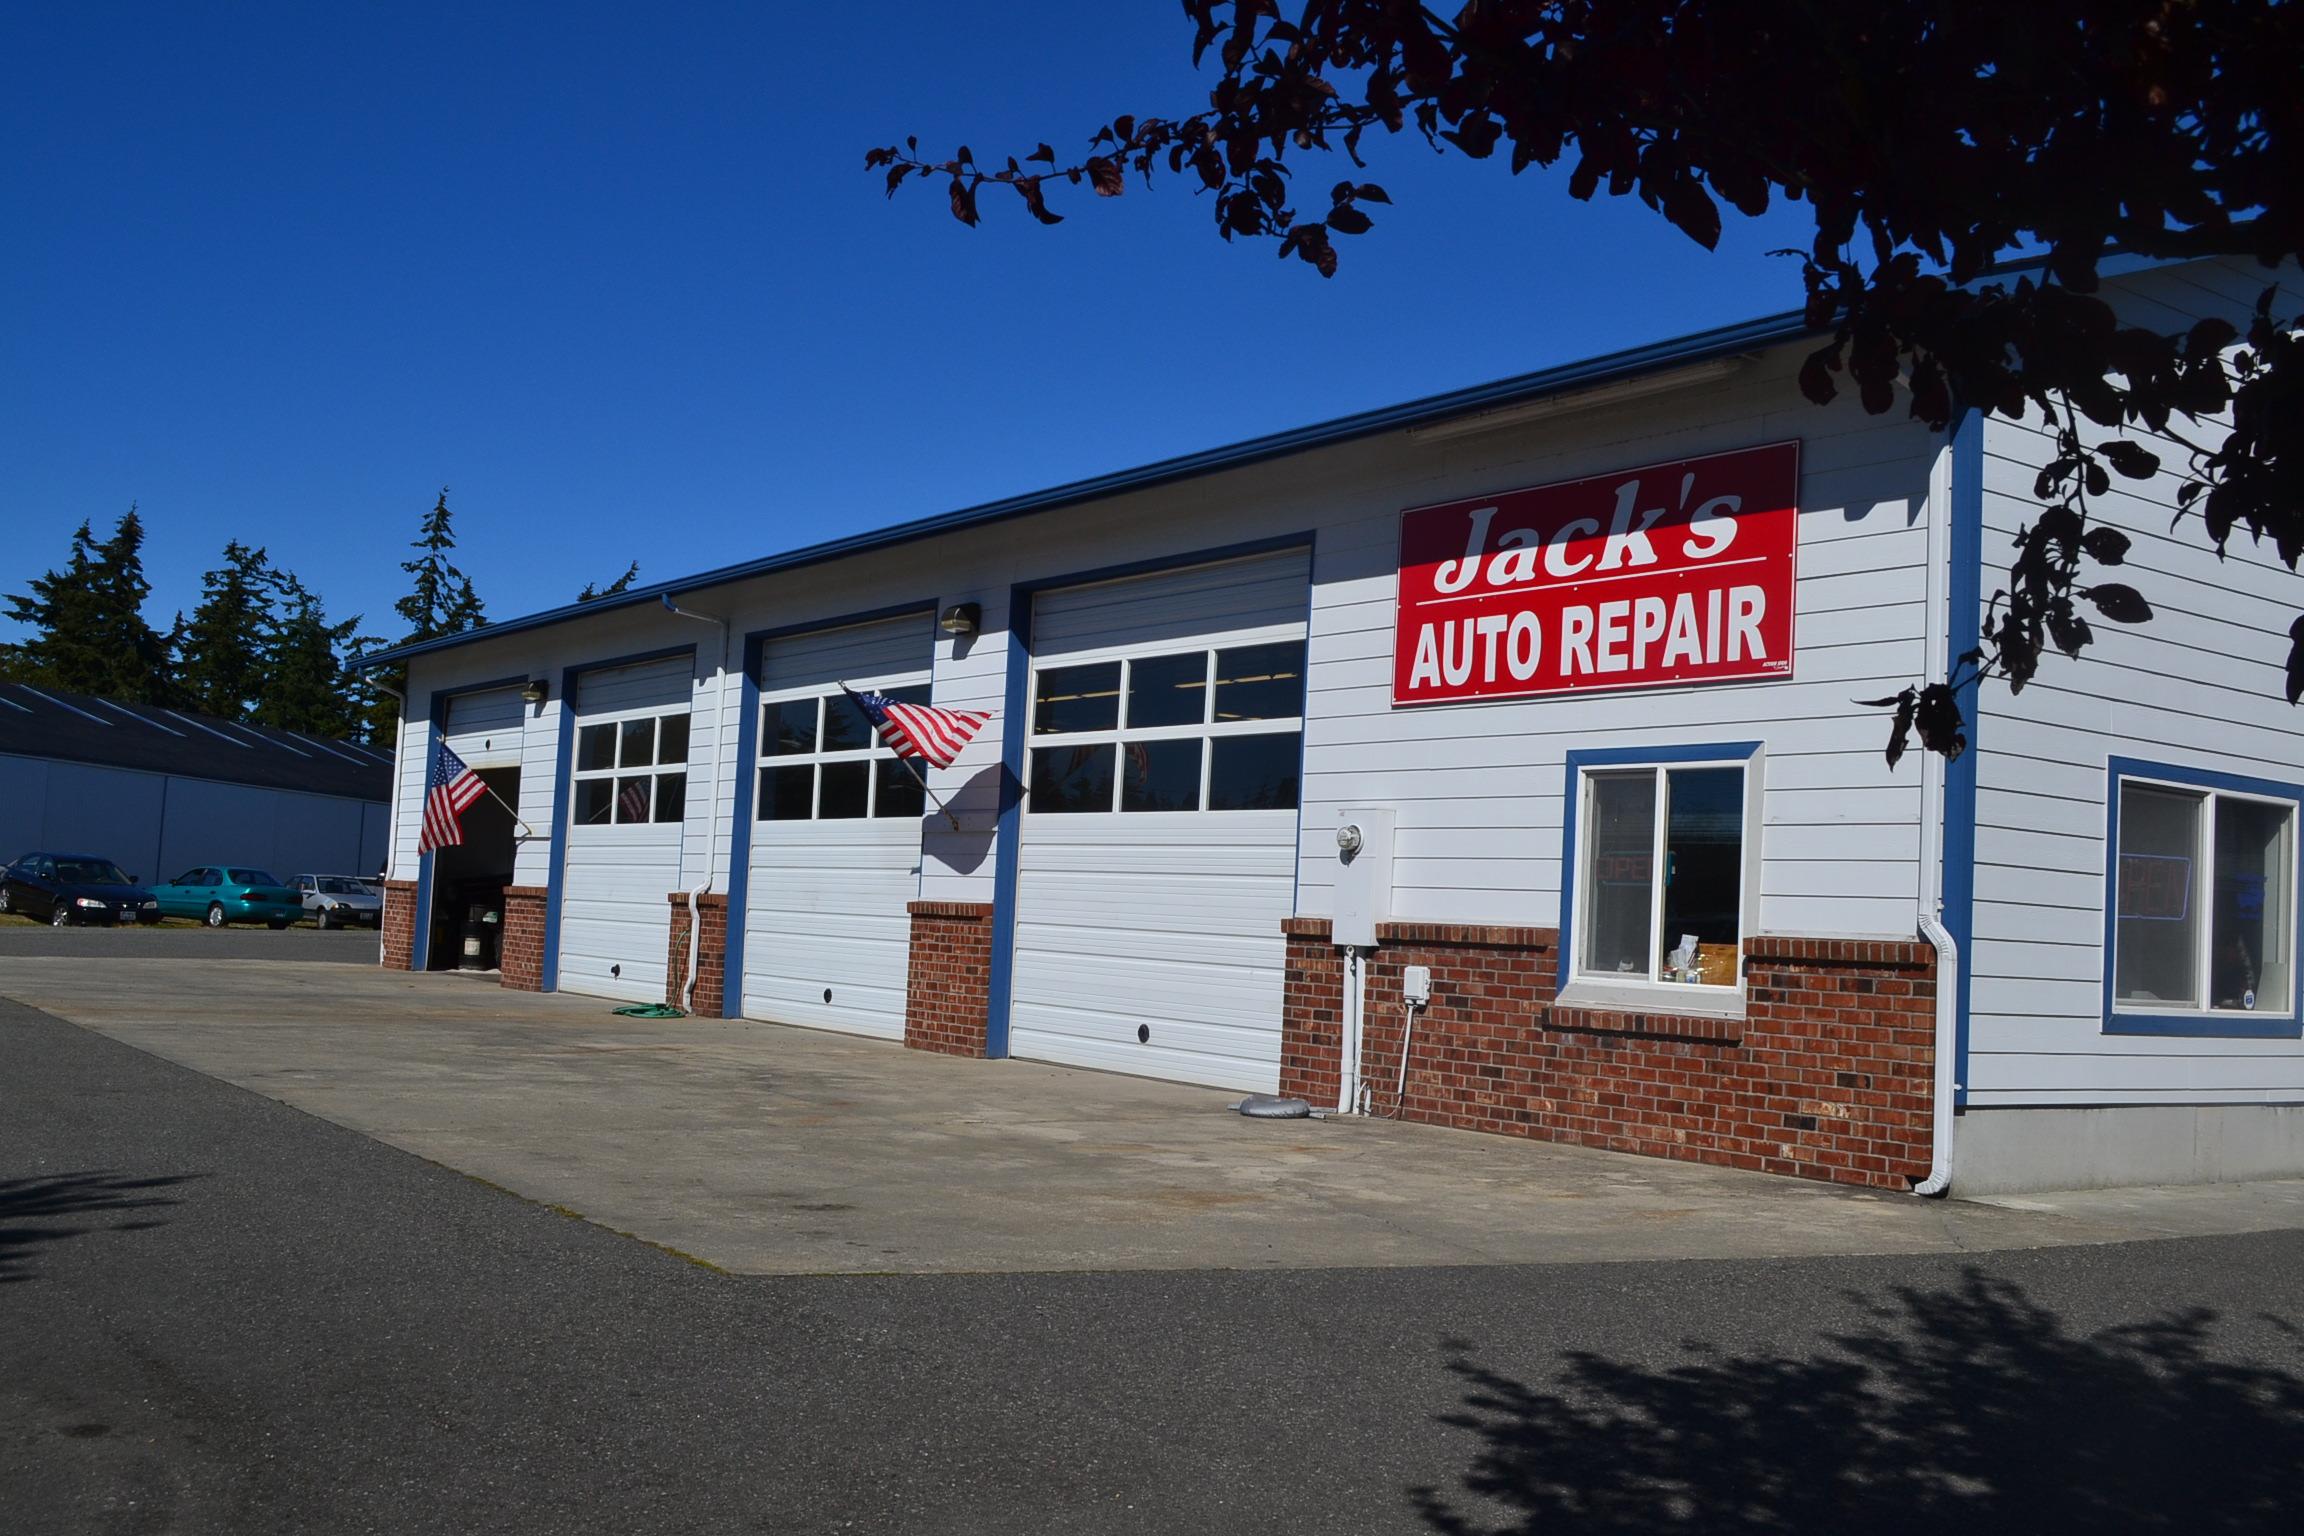 Home jacksauto for Oak harbor motors service department